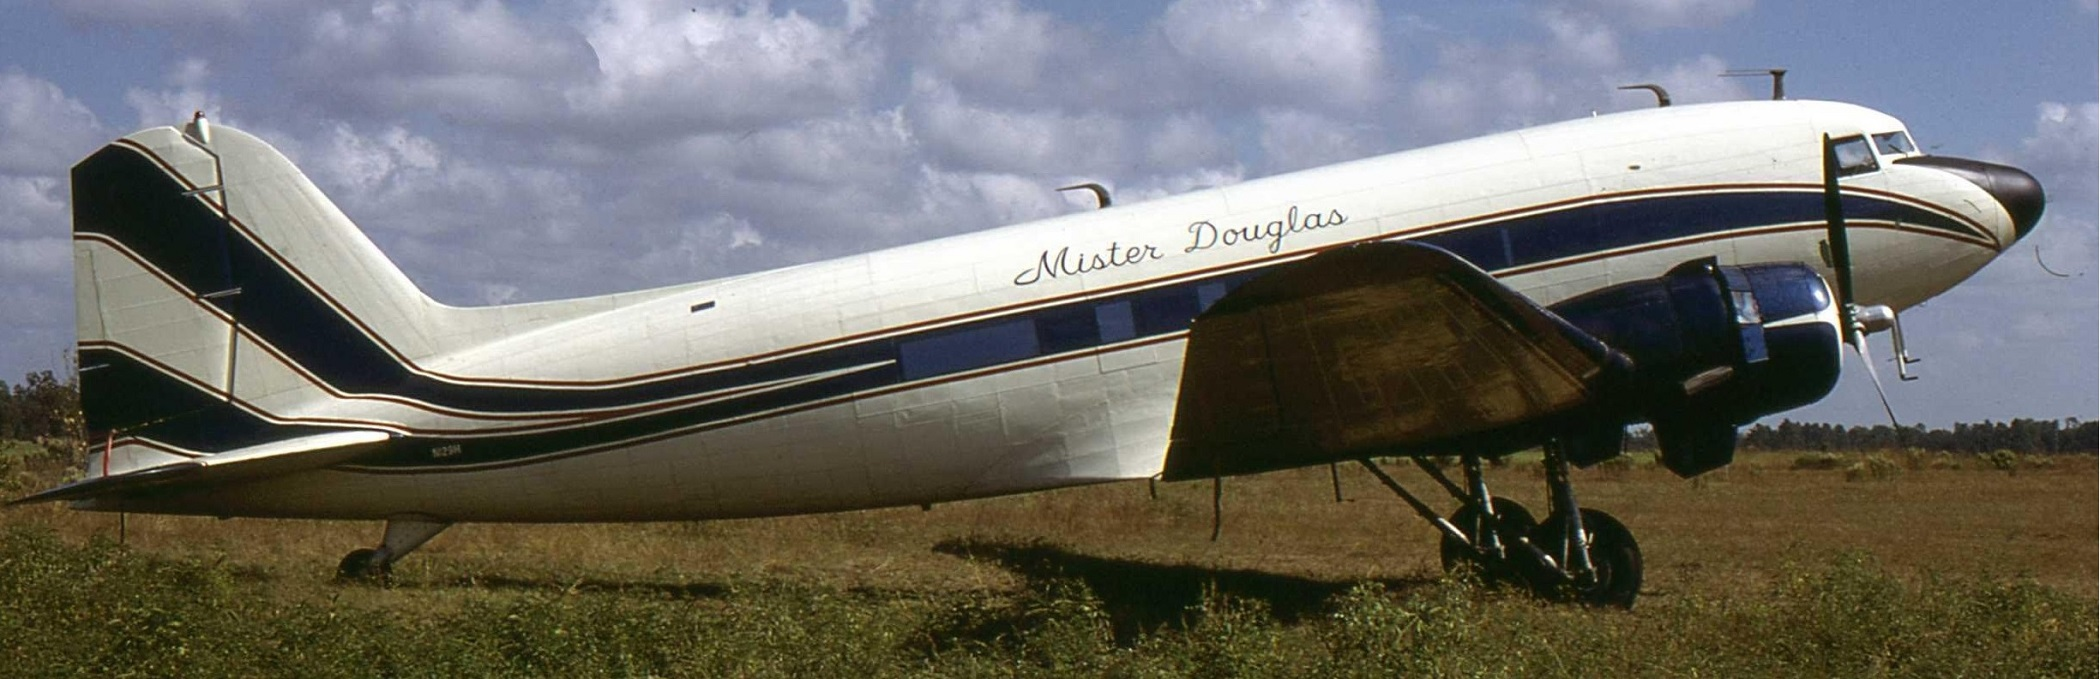 "The famed DC-3 ""Mister Douglas""."